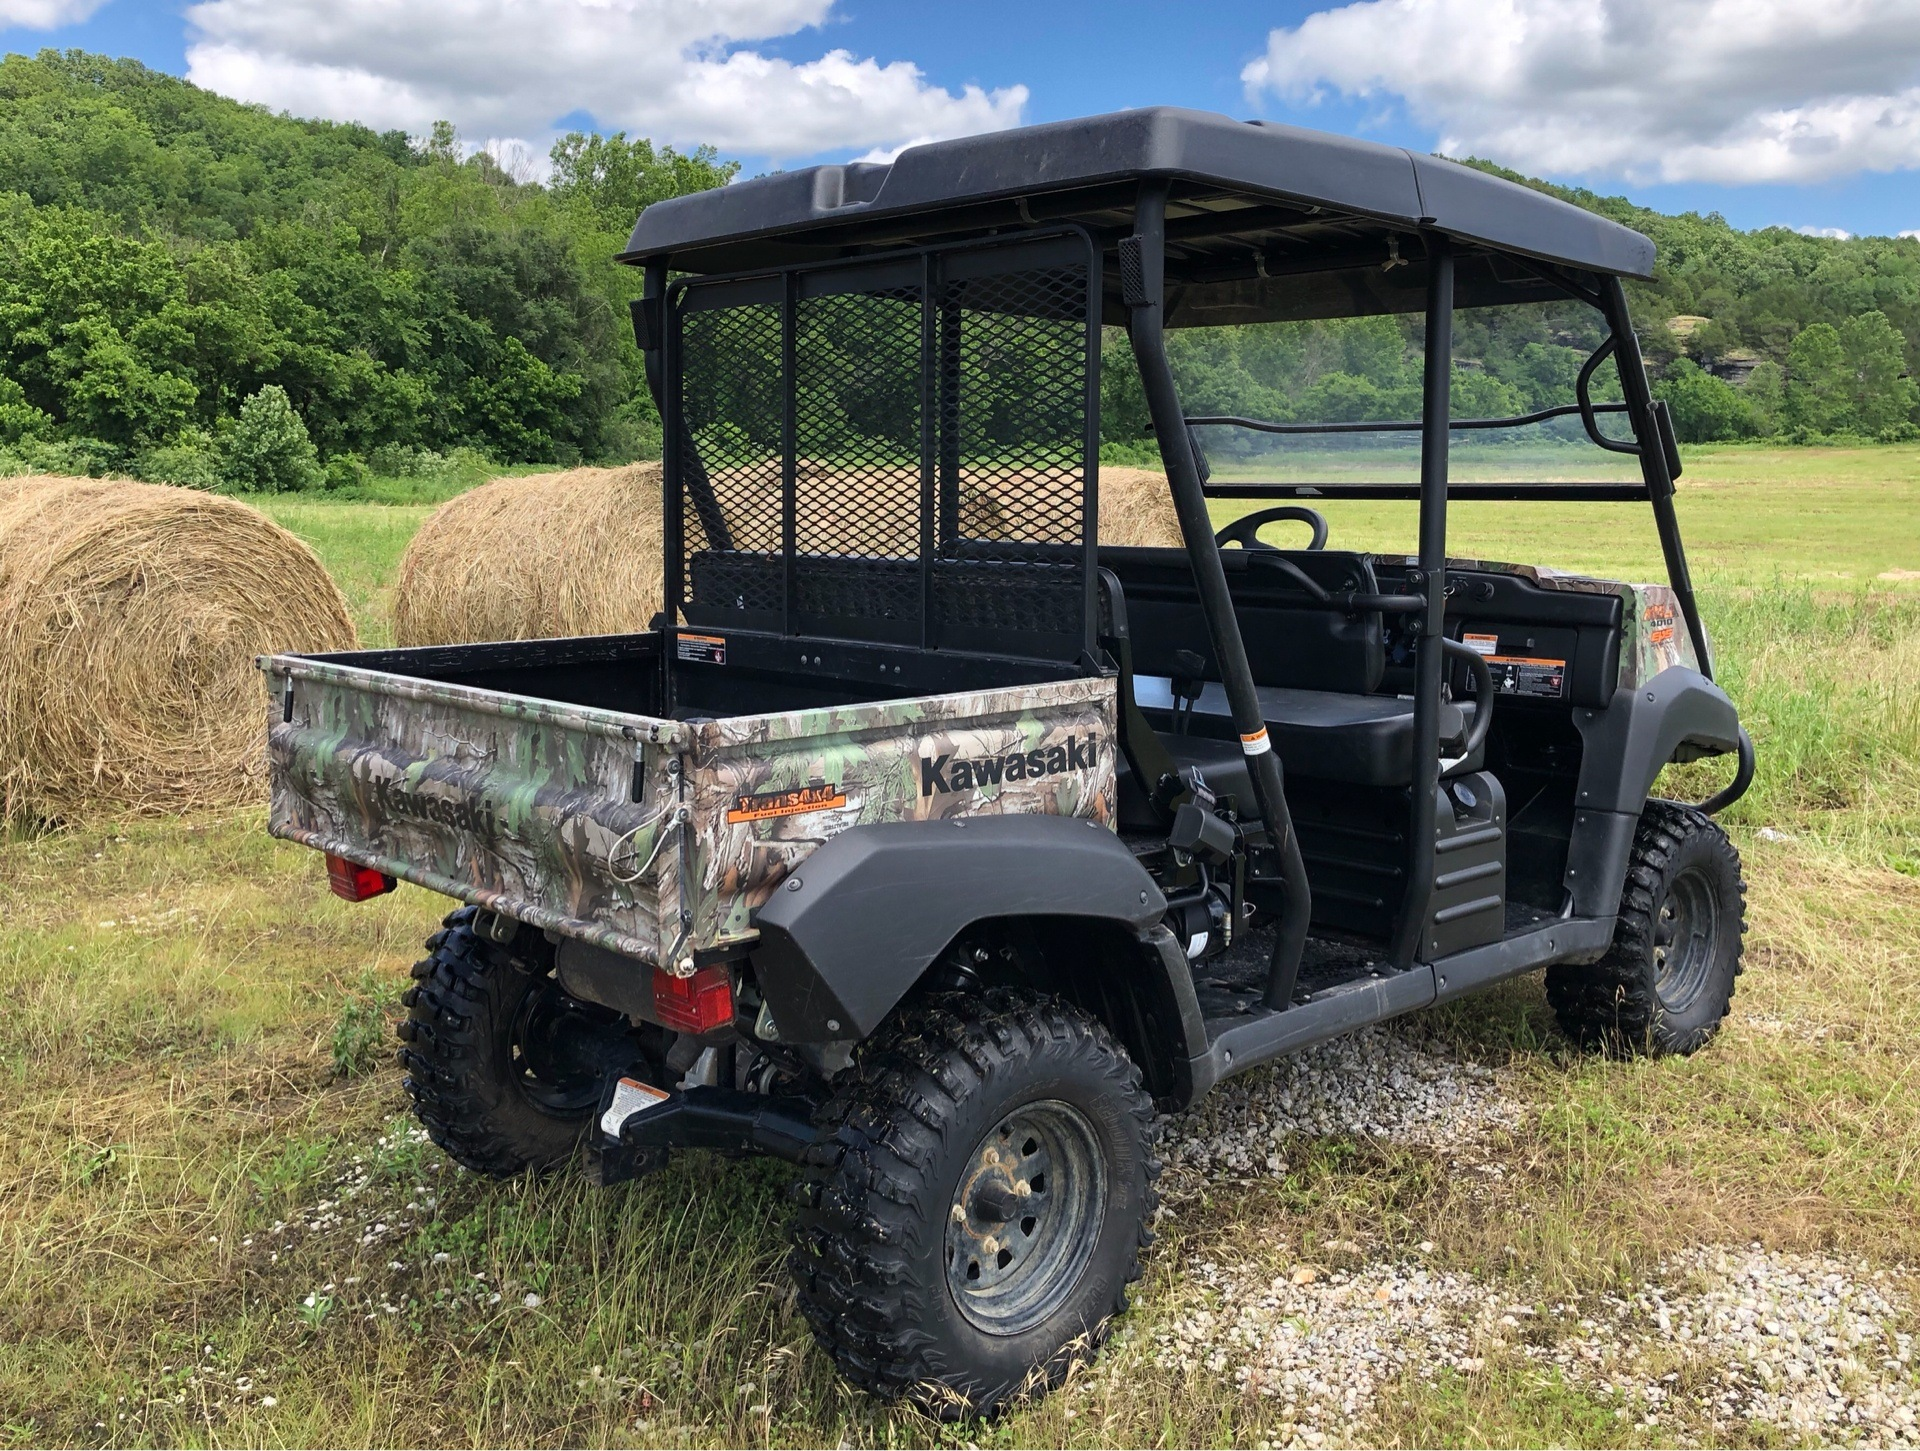 Used 2017 Kawasaki Mule 4010 Trans4x4 Camo Utility Vehicles